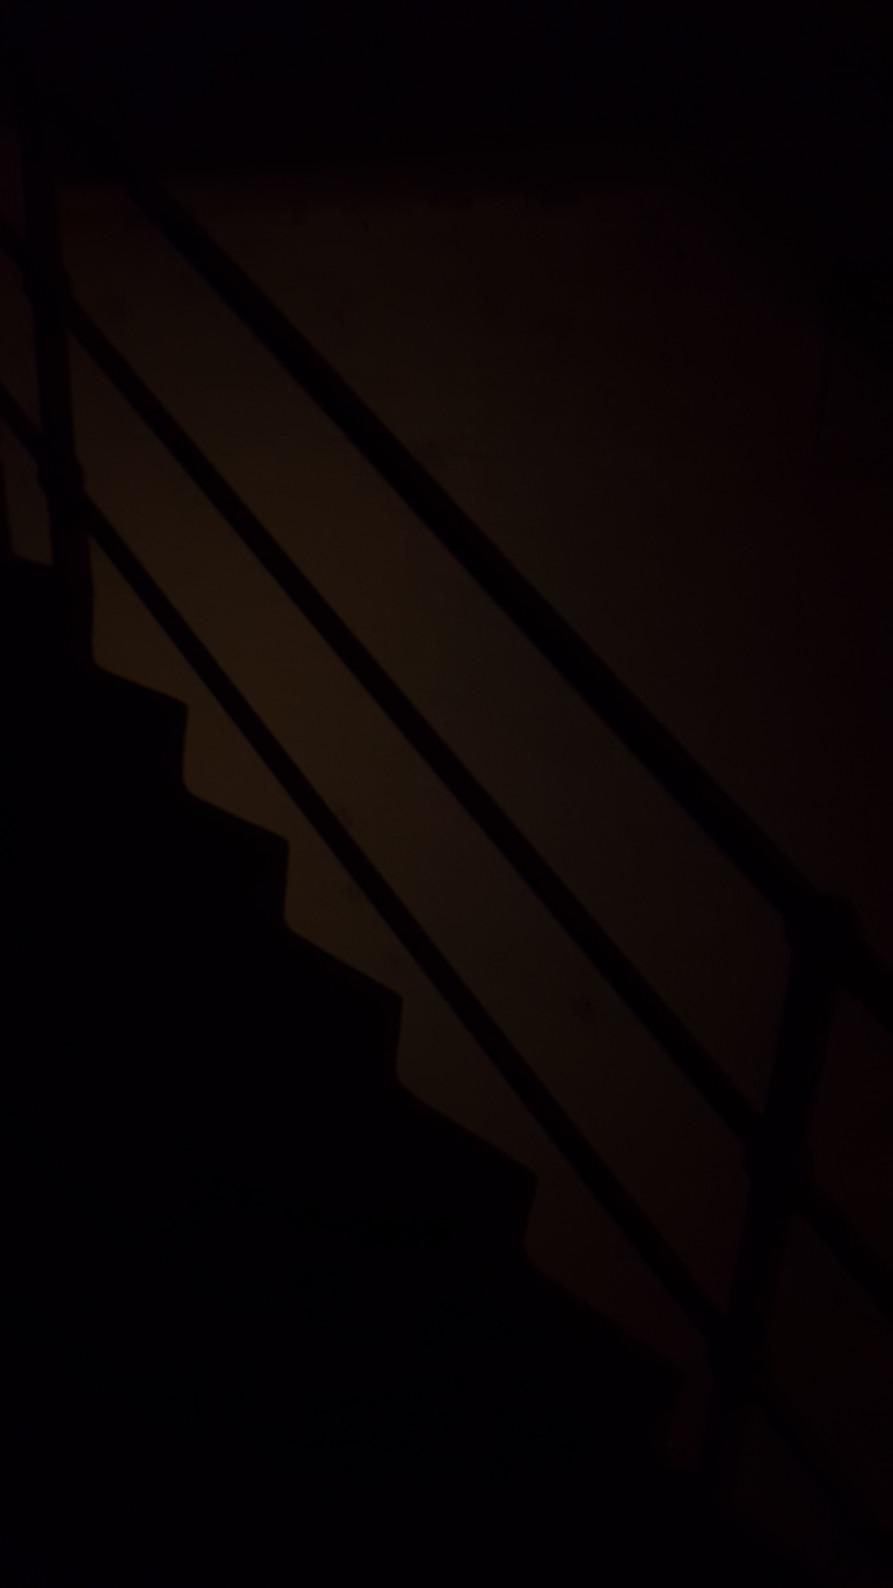 Joe Slater, Stairs, Falling, 2020